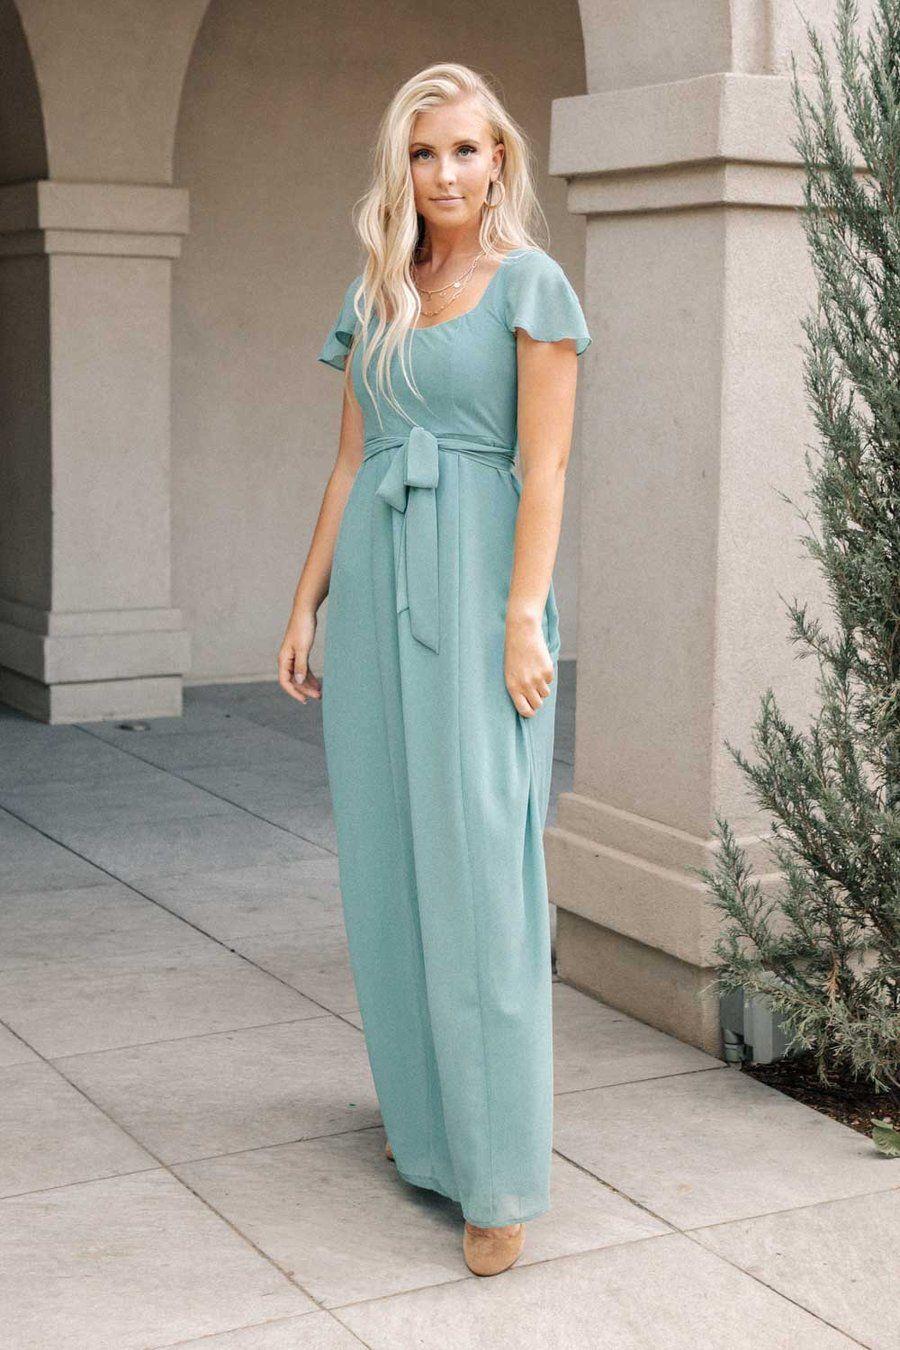 Florence Sweetheart Maxi Dress In Sage Maxi Dress Sage Dress Dresses [ 1350 x 900 Pixel ]